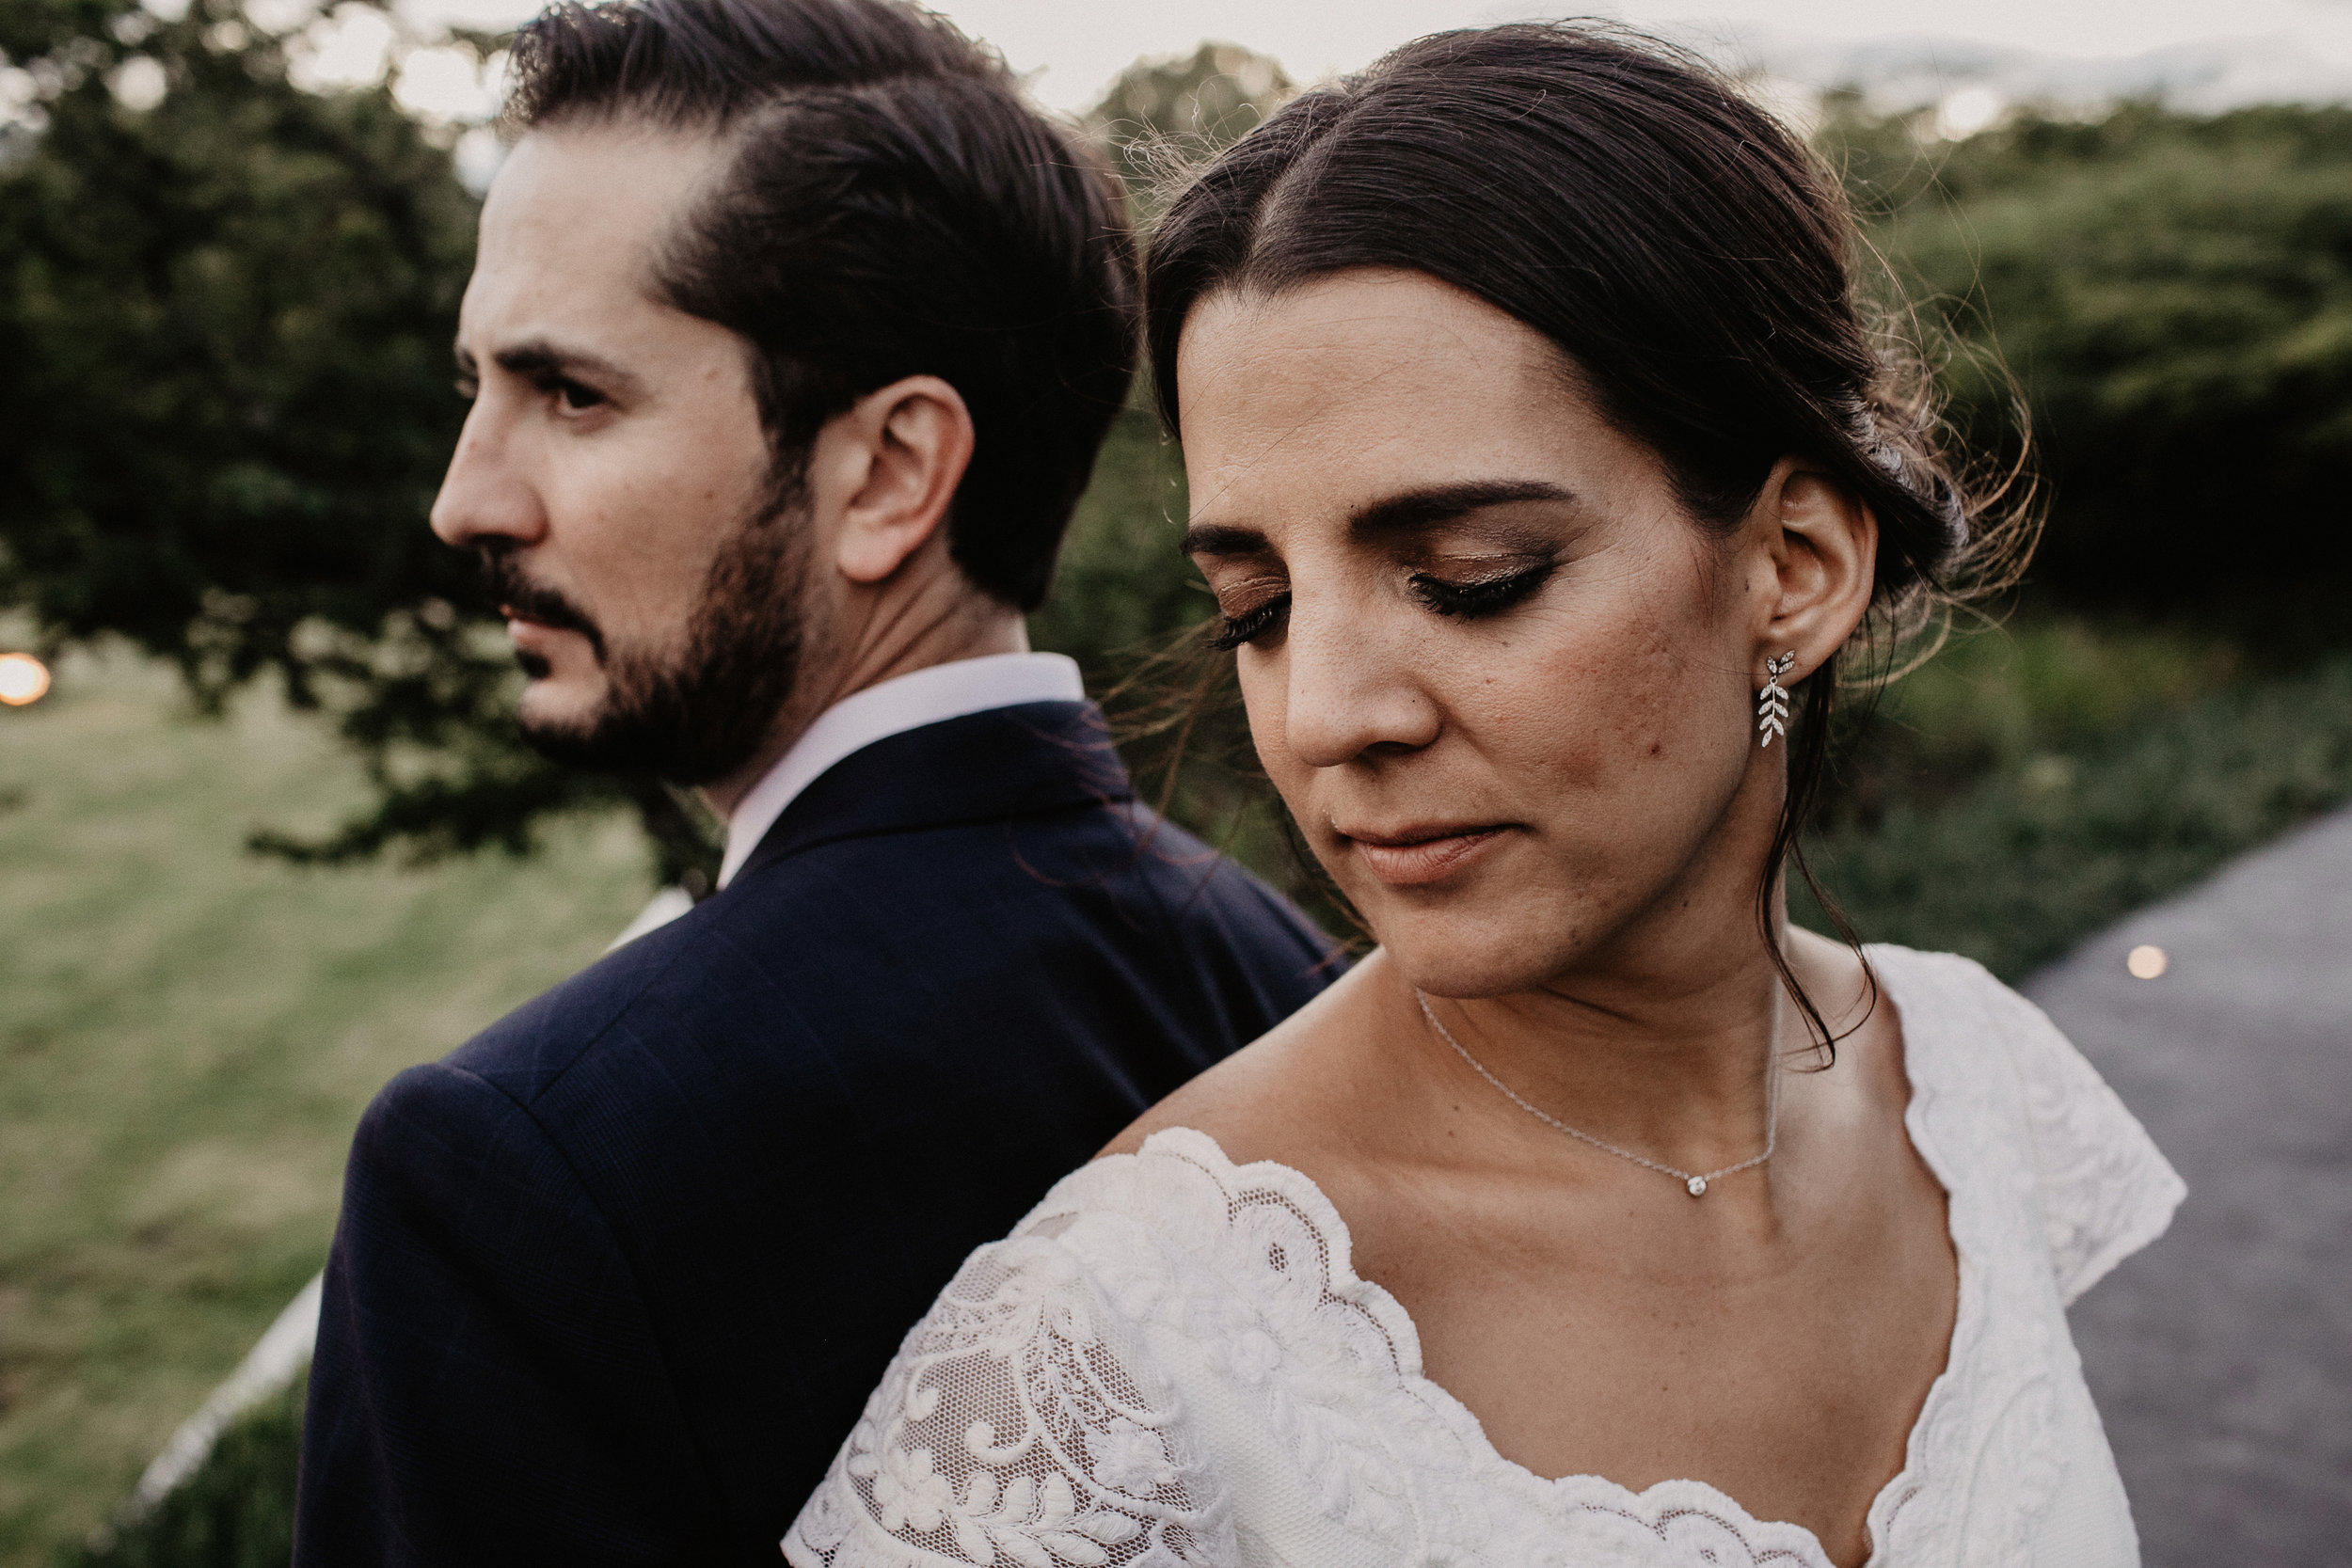 alfonso_flores_destination_wedding_photographer_pau_alonso_1034.JPG